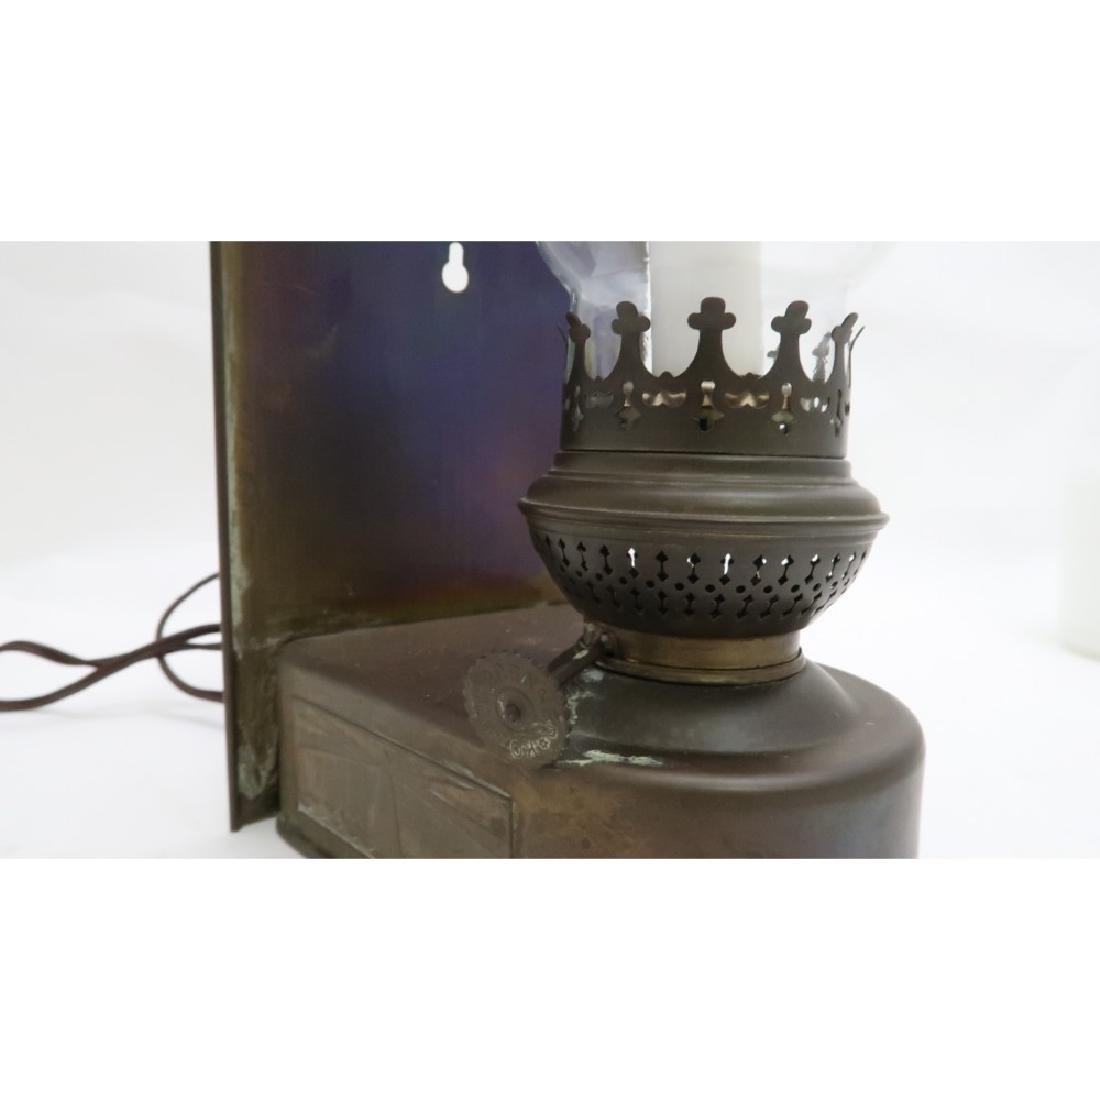 Old Brass Lantern - Electrified - Glass shade is wavy - 2